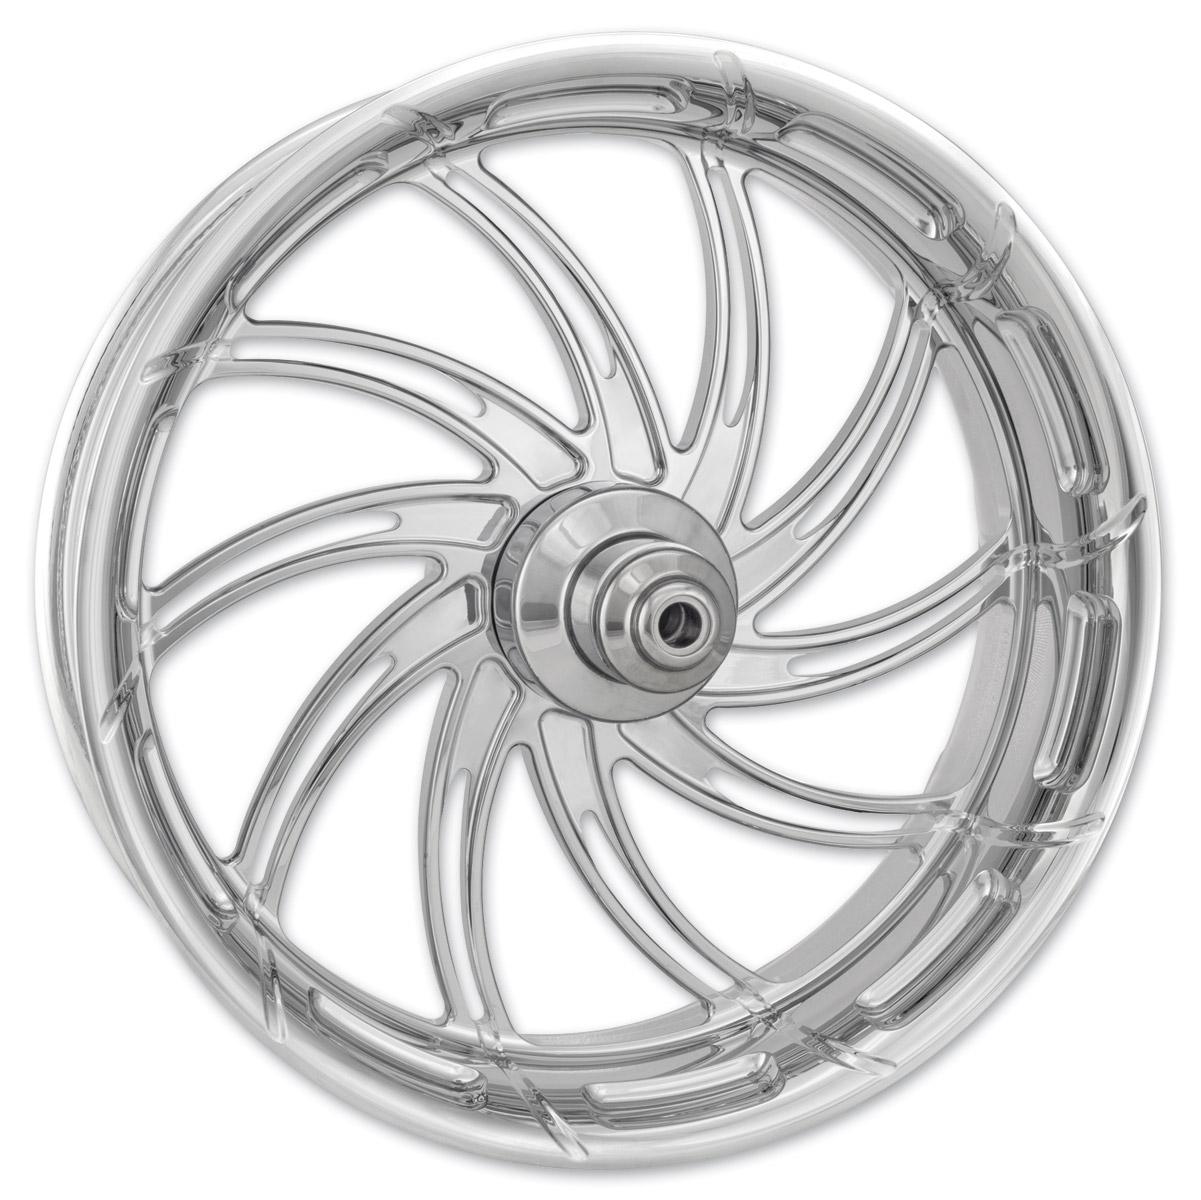 Performance Machine Supra Chrome Non-ABS Front Wheel, 23″ x 3.5″